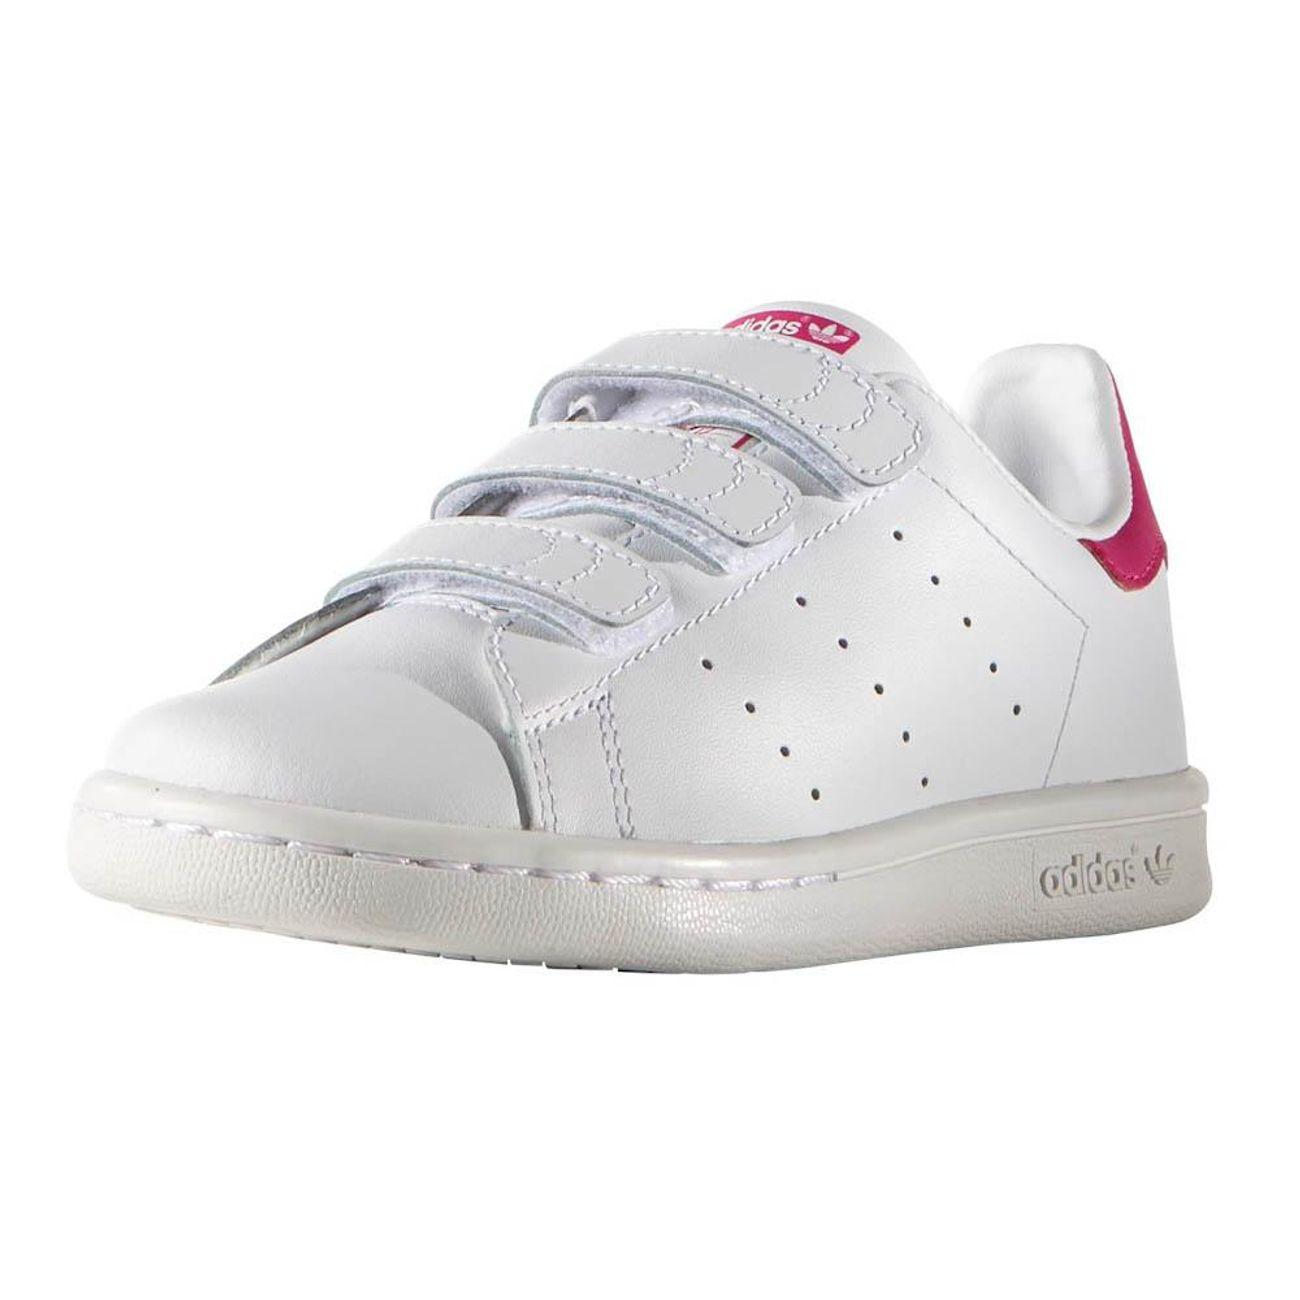 Mode Lifestyle fille ADIDAS ORIGINALS Basket adidas Originals Stan Smith CF Cadet Ref. B32706